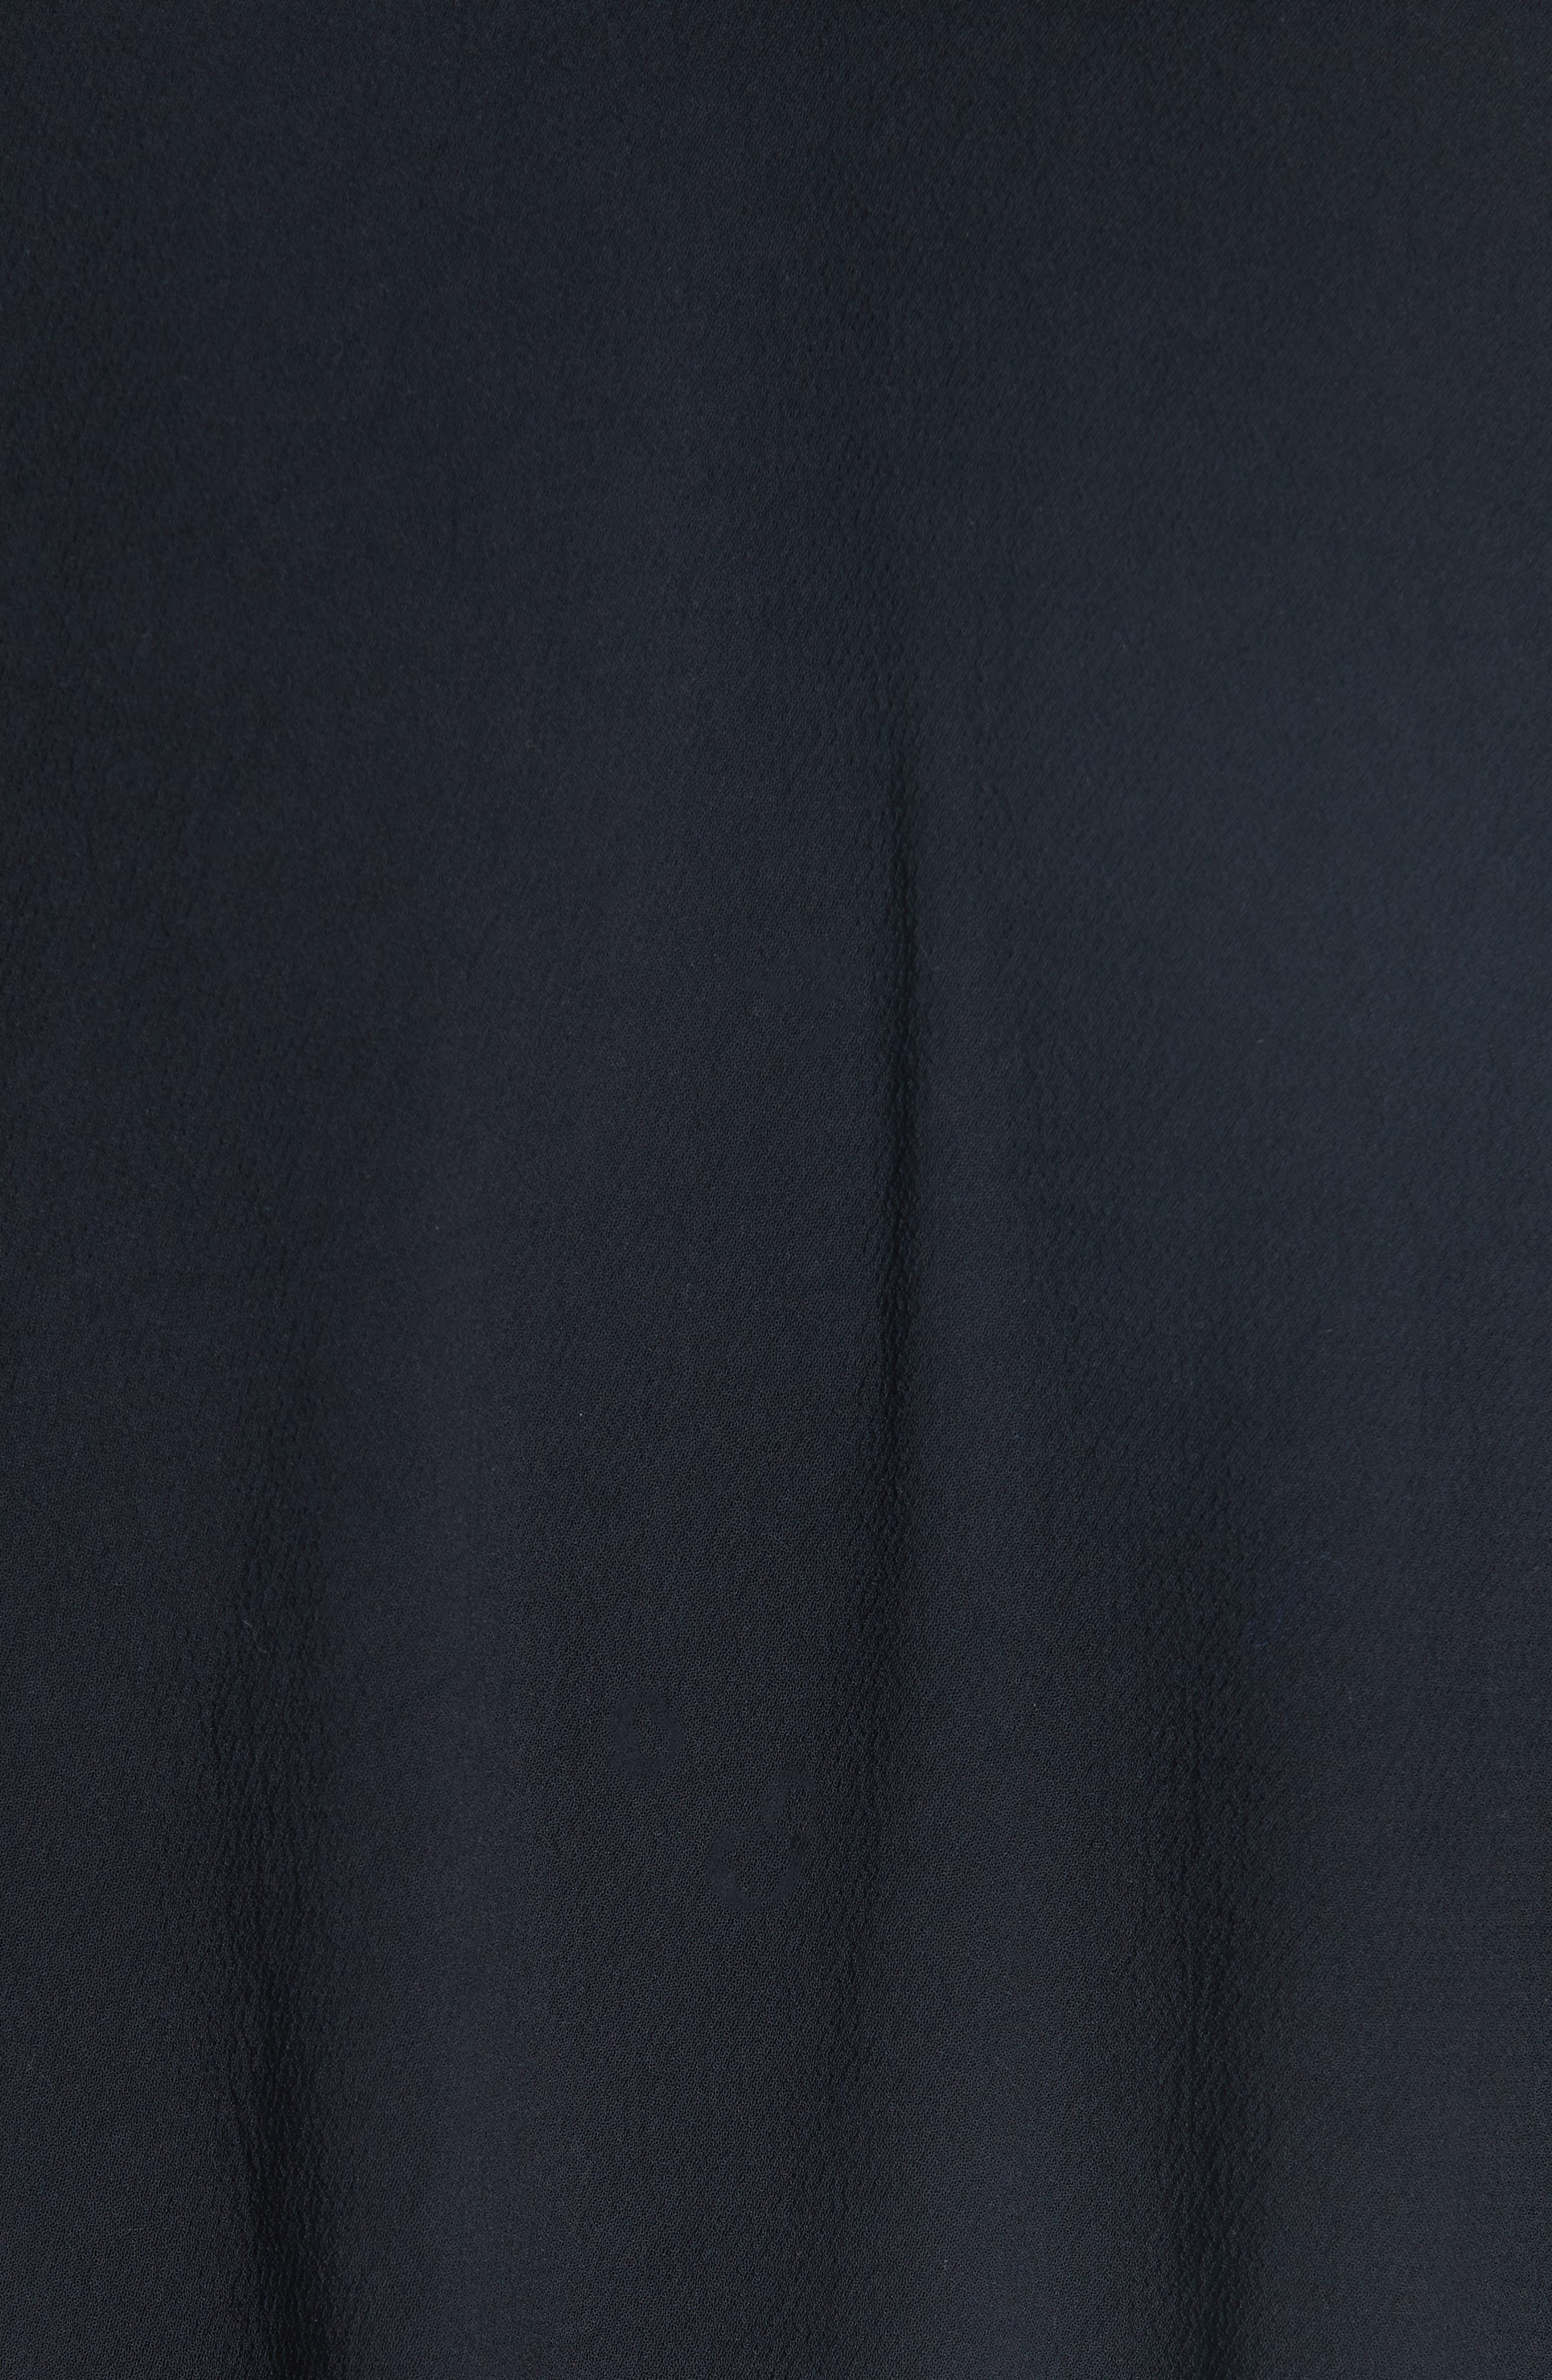 Cycy Bow Back Jumpsuit,                             Alternate thumbnail 5, color,                             NOIR